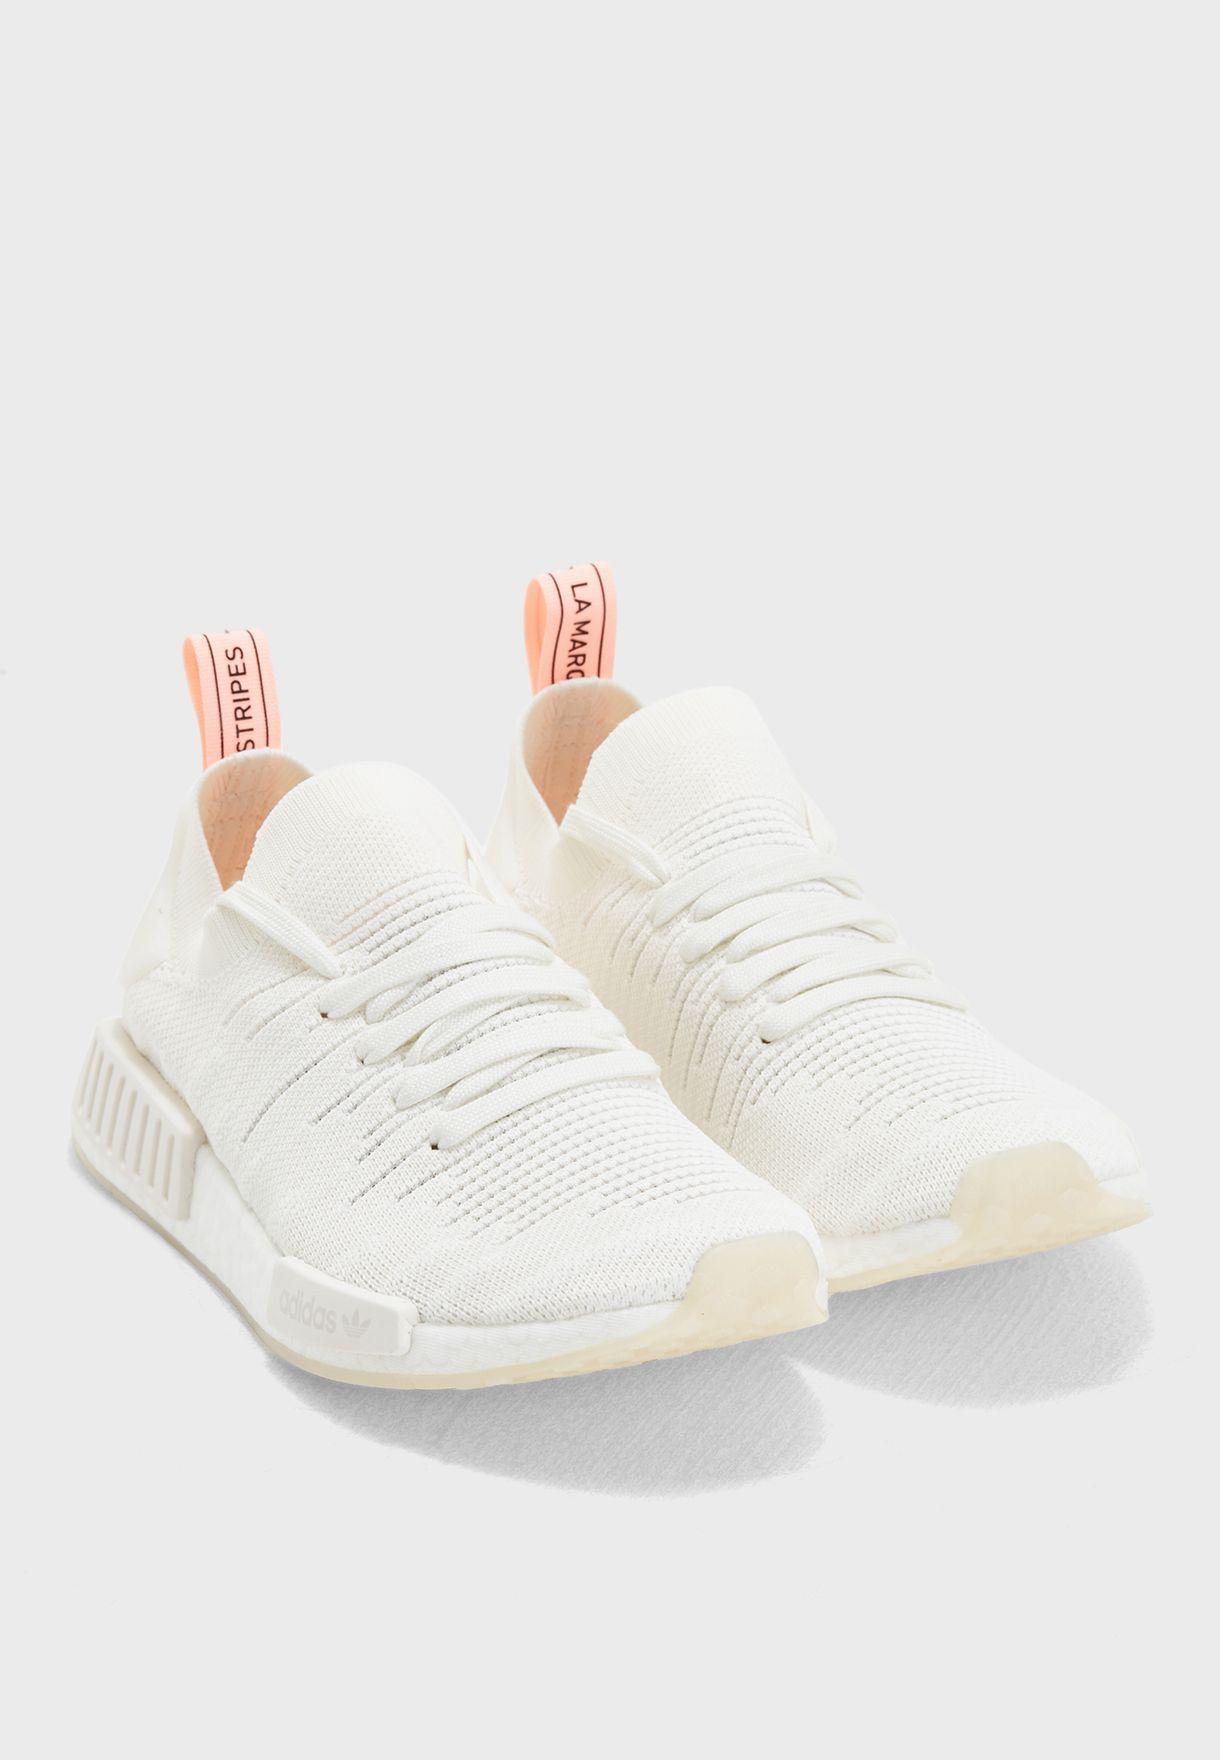 c8fc82b18 Shop adidas Originals white NMD R1 STLT PK B37655 for Women in UAE ...